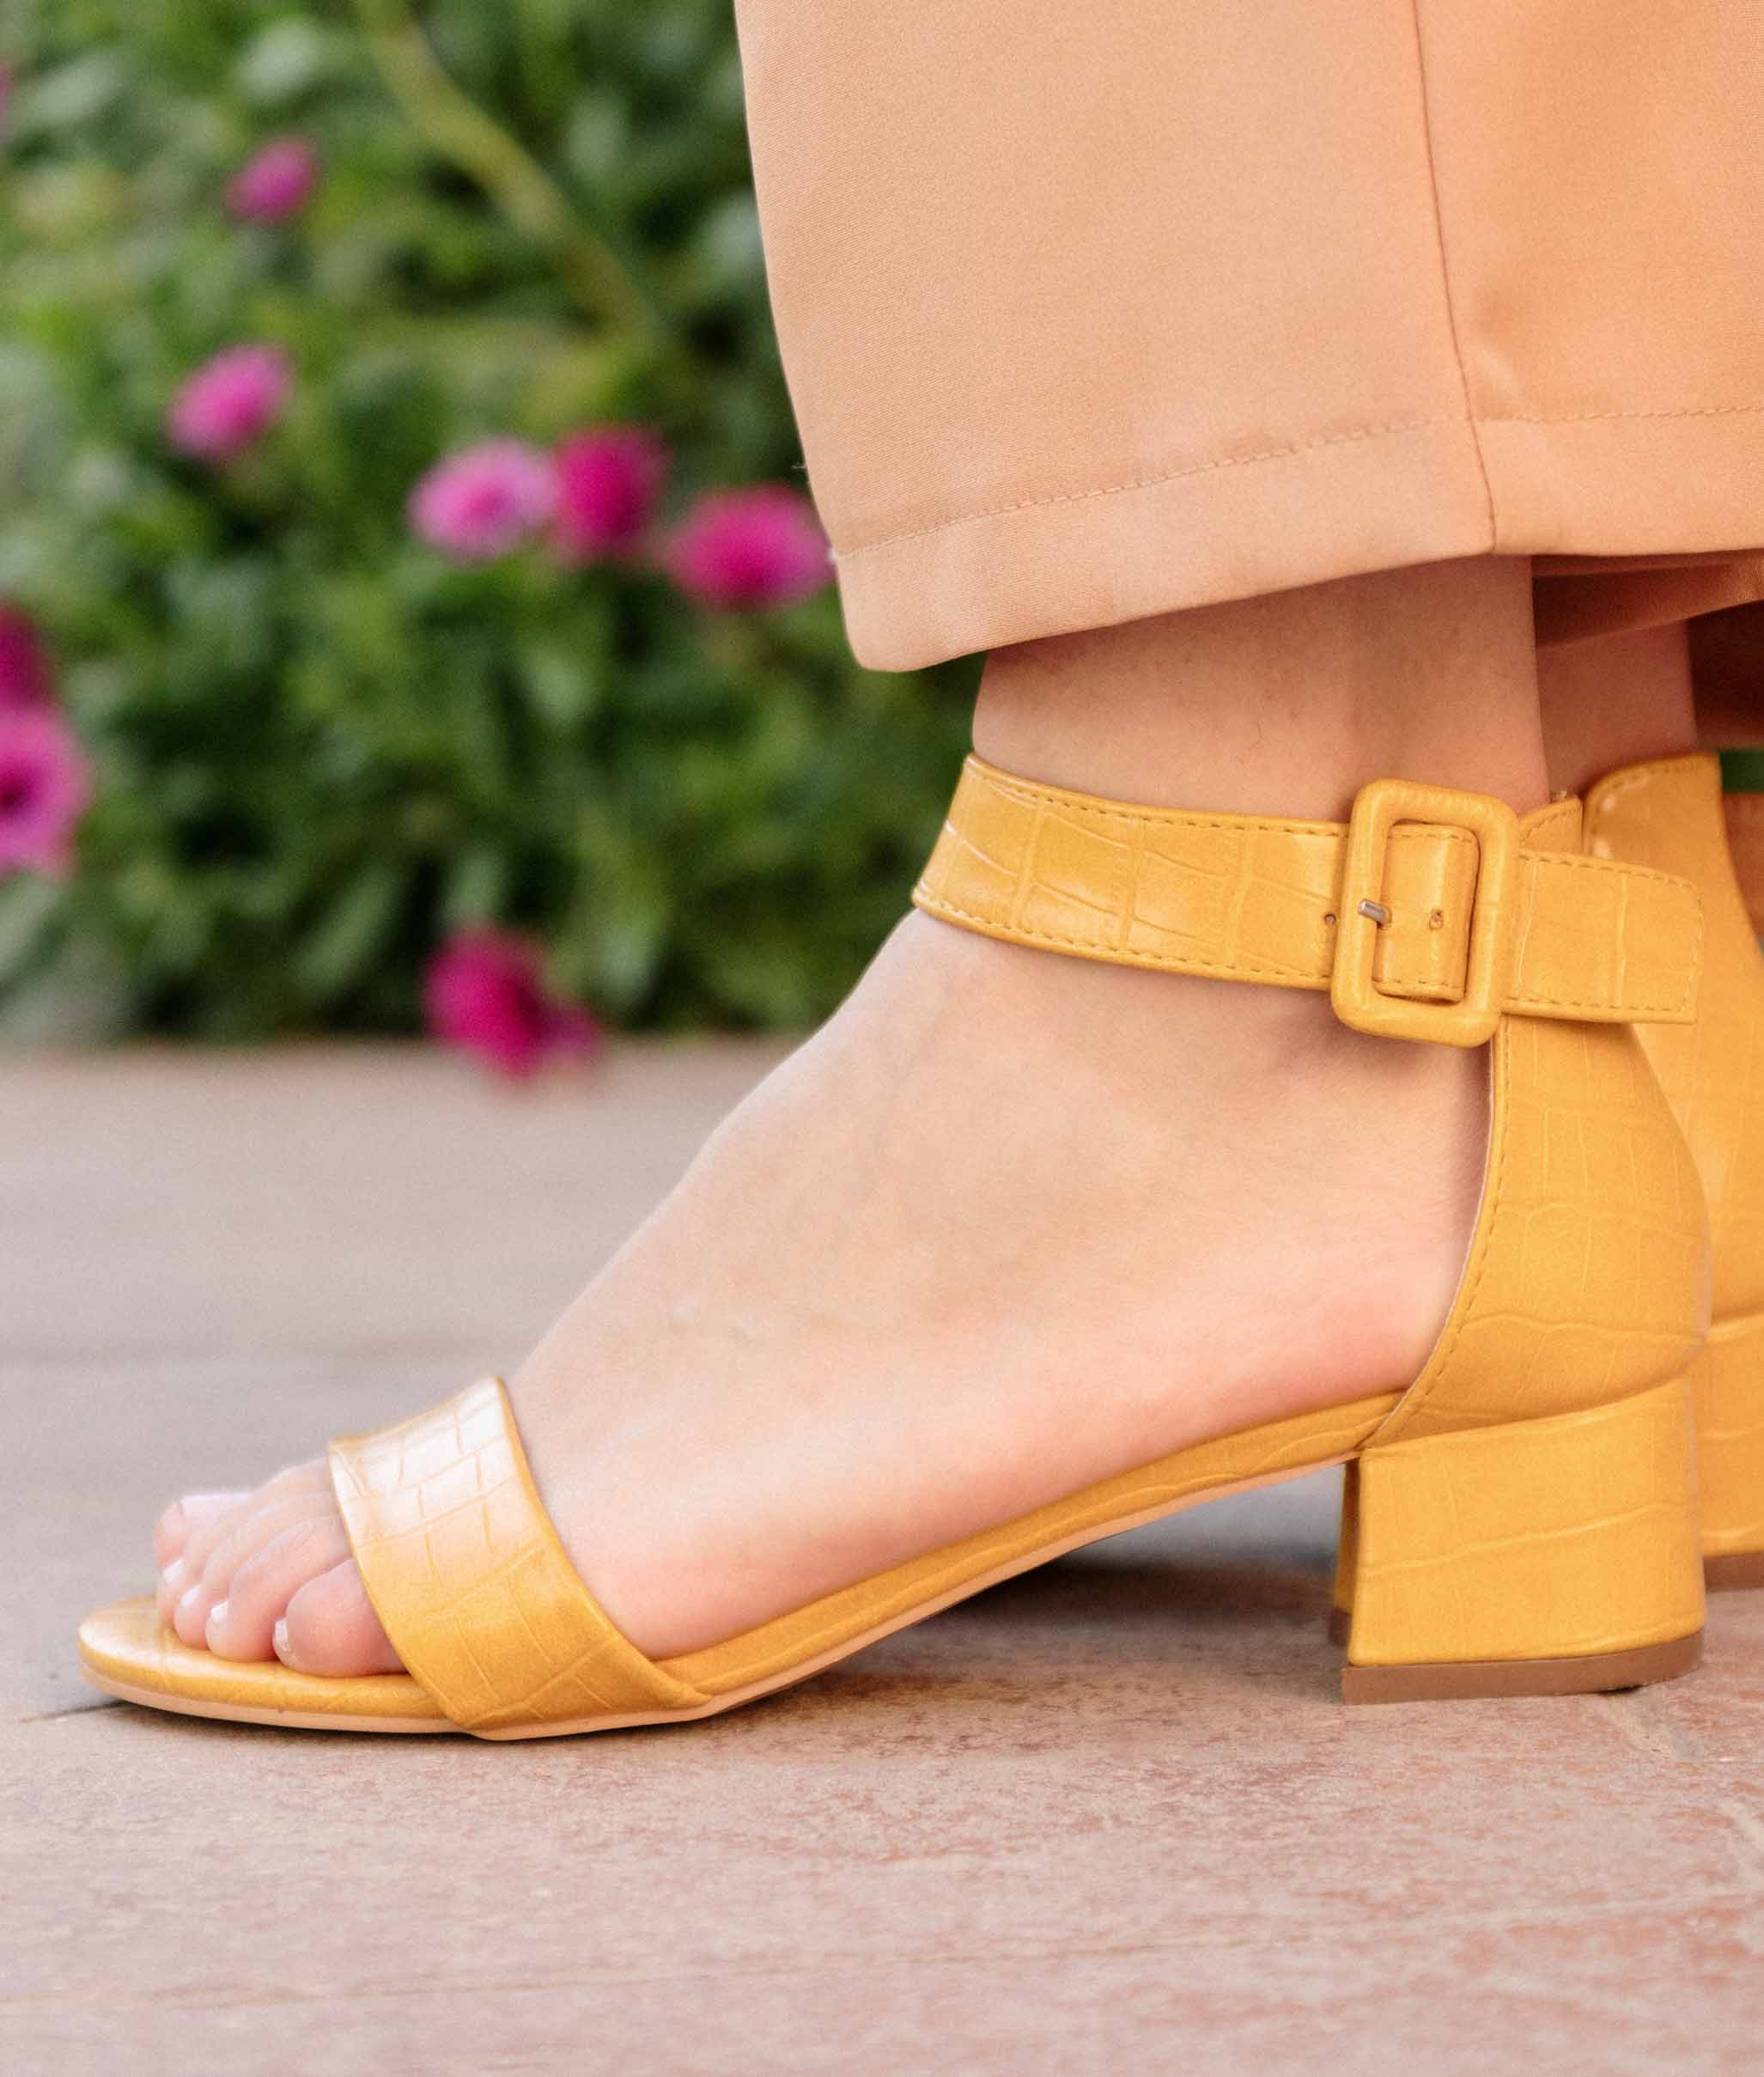 Sapato Scarpin Amarelo | Salto Alto | Calçados Diferente